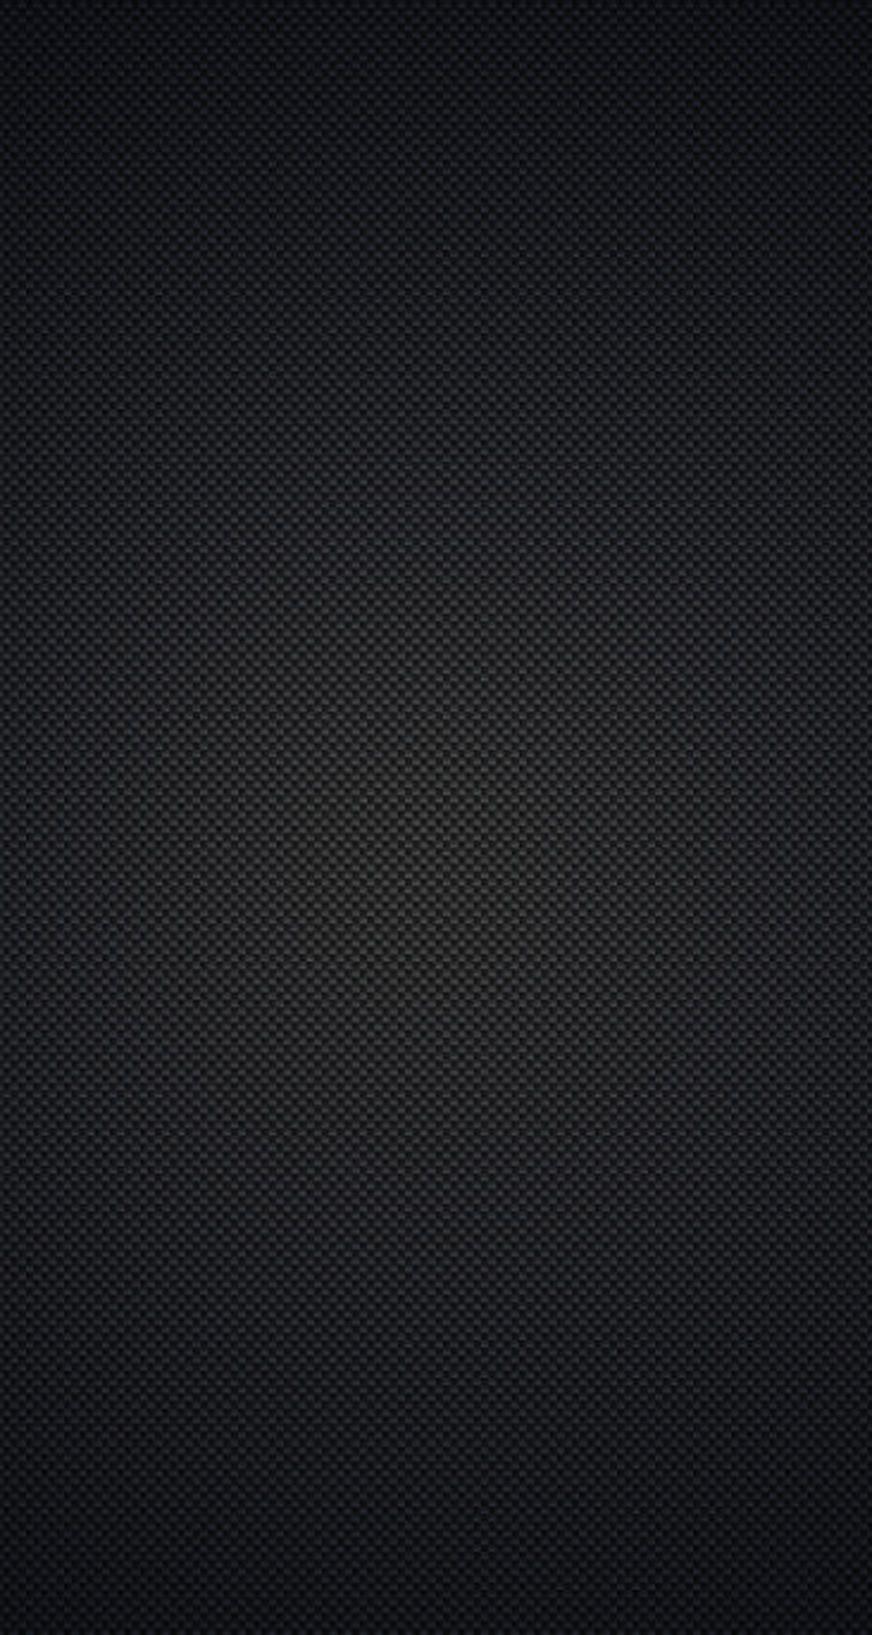 Hd wallpaper iphone 7 - Nice Iphone 7 Wallpaper Hd 323